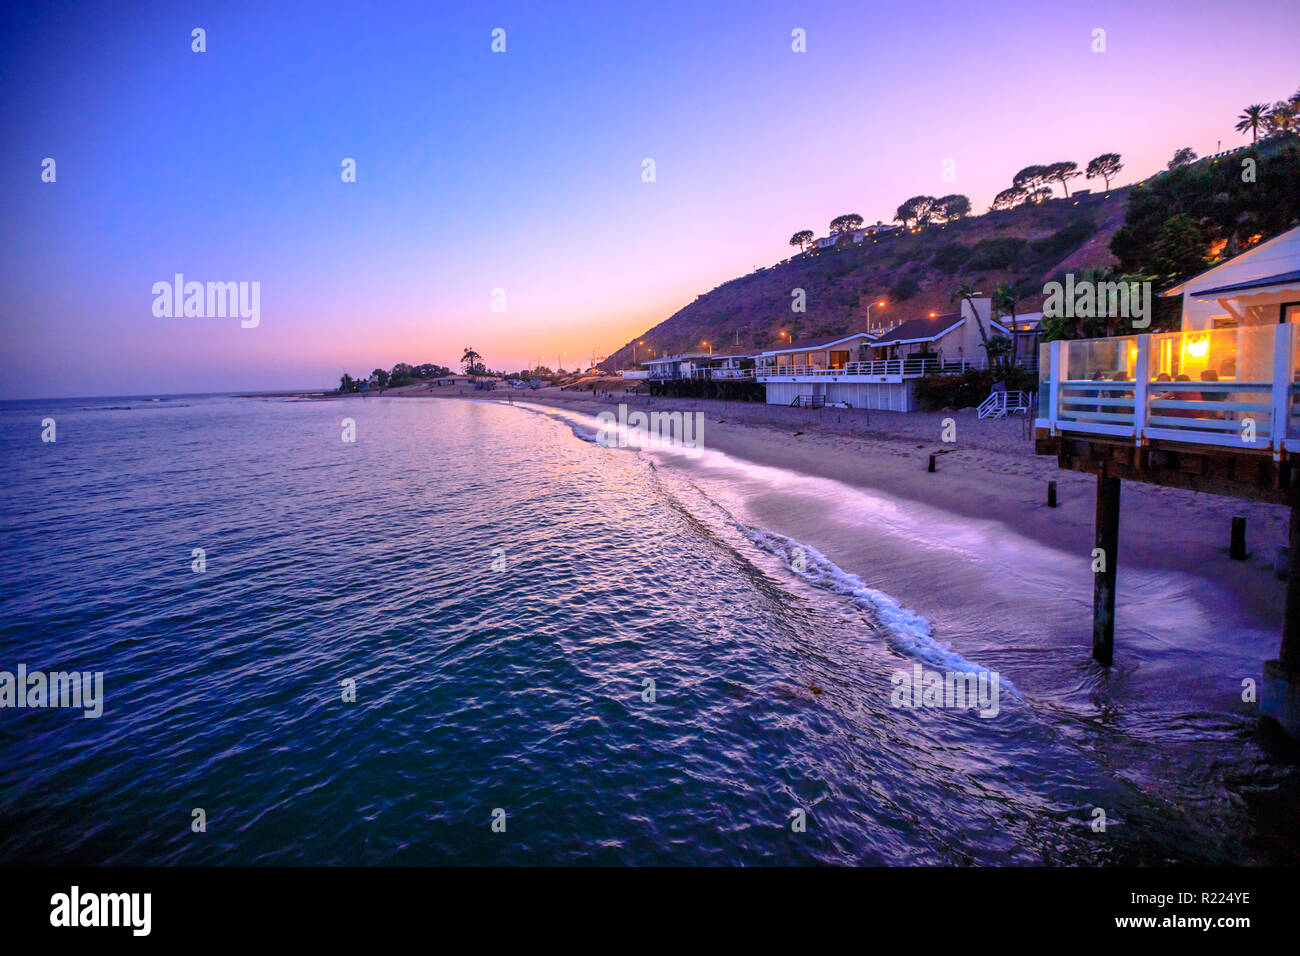 Scenic Coastal Landscape With Santa Monica Mountains And Surfrider Beach At Dusk Iluminated By Night Malibu California United States Californian West Coast Travel Copy Space Stock Photo Alamy